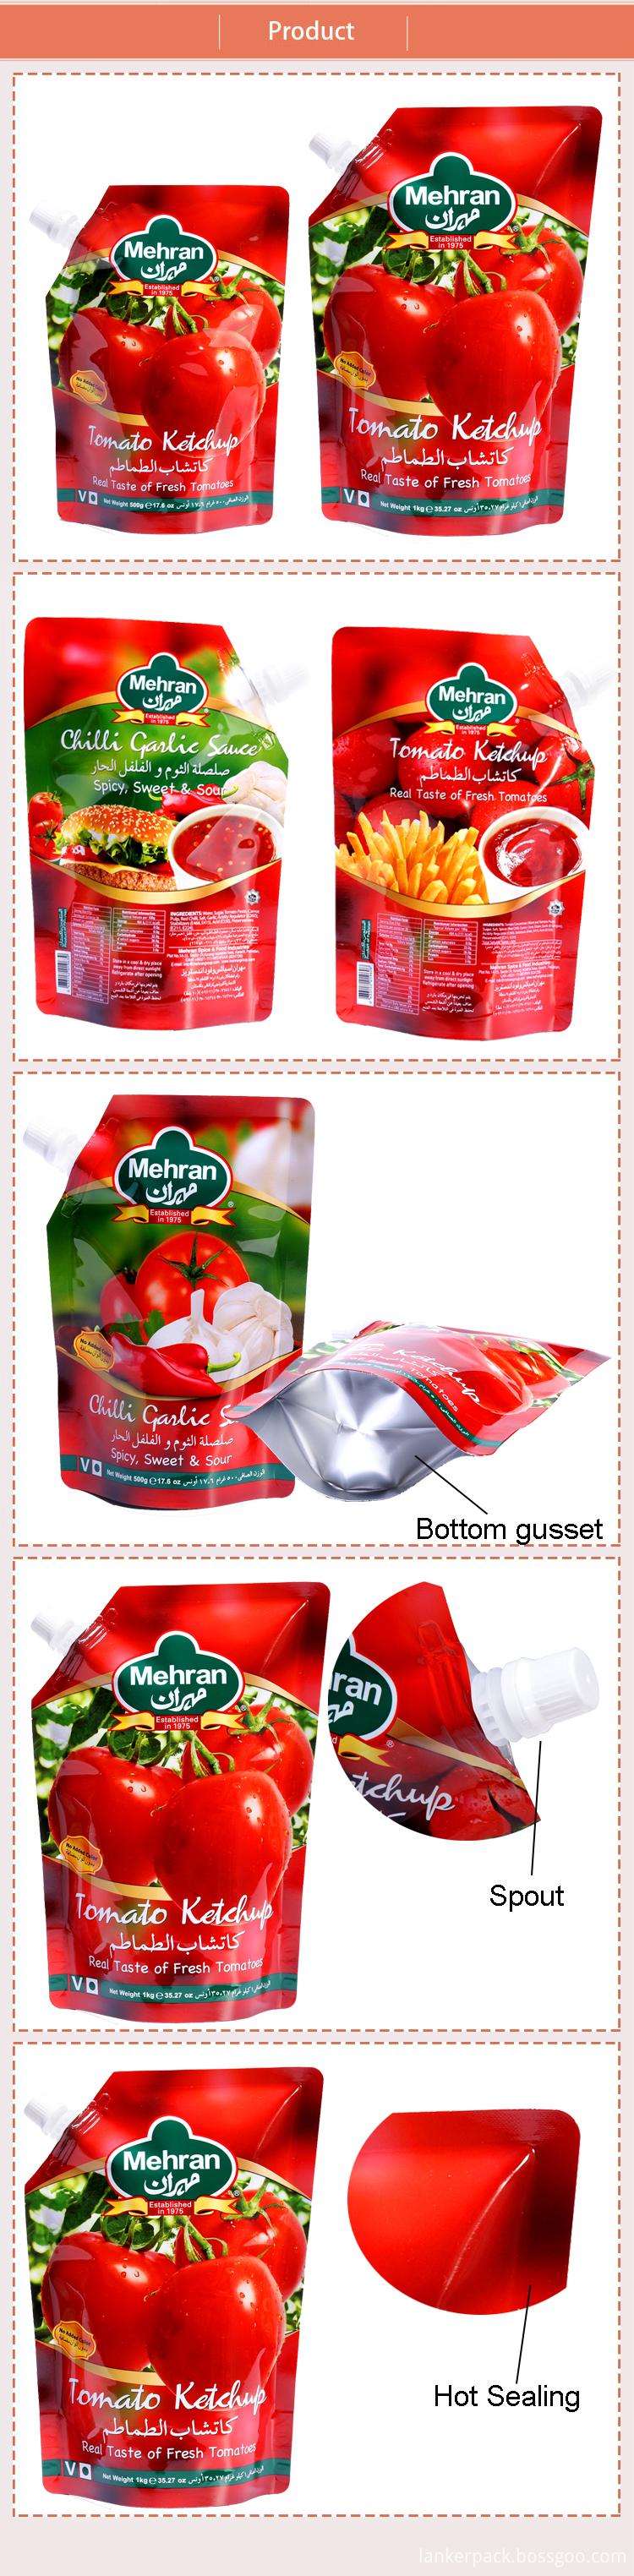 Ketchup spout pouch